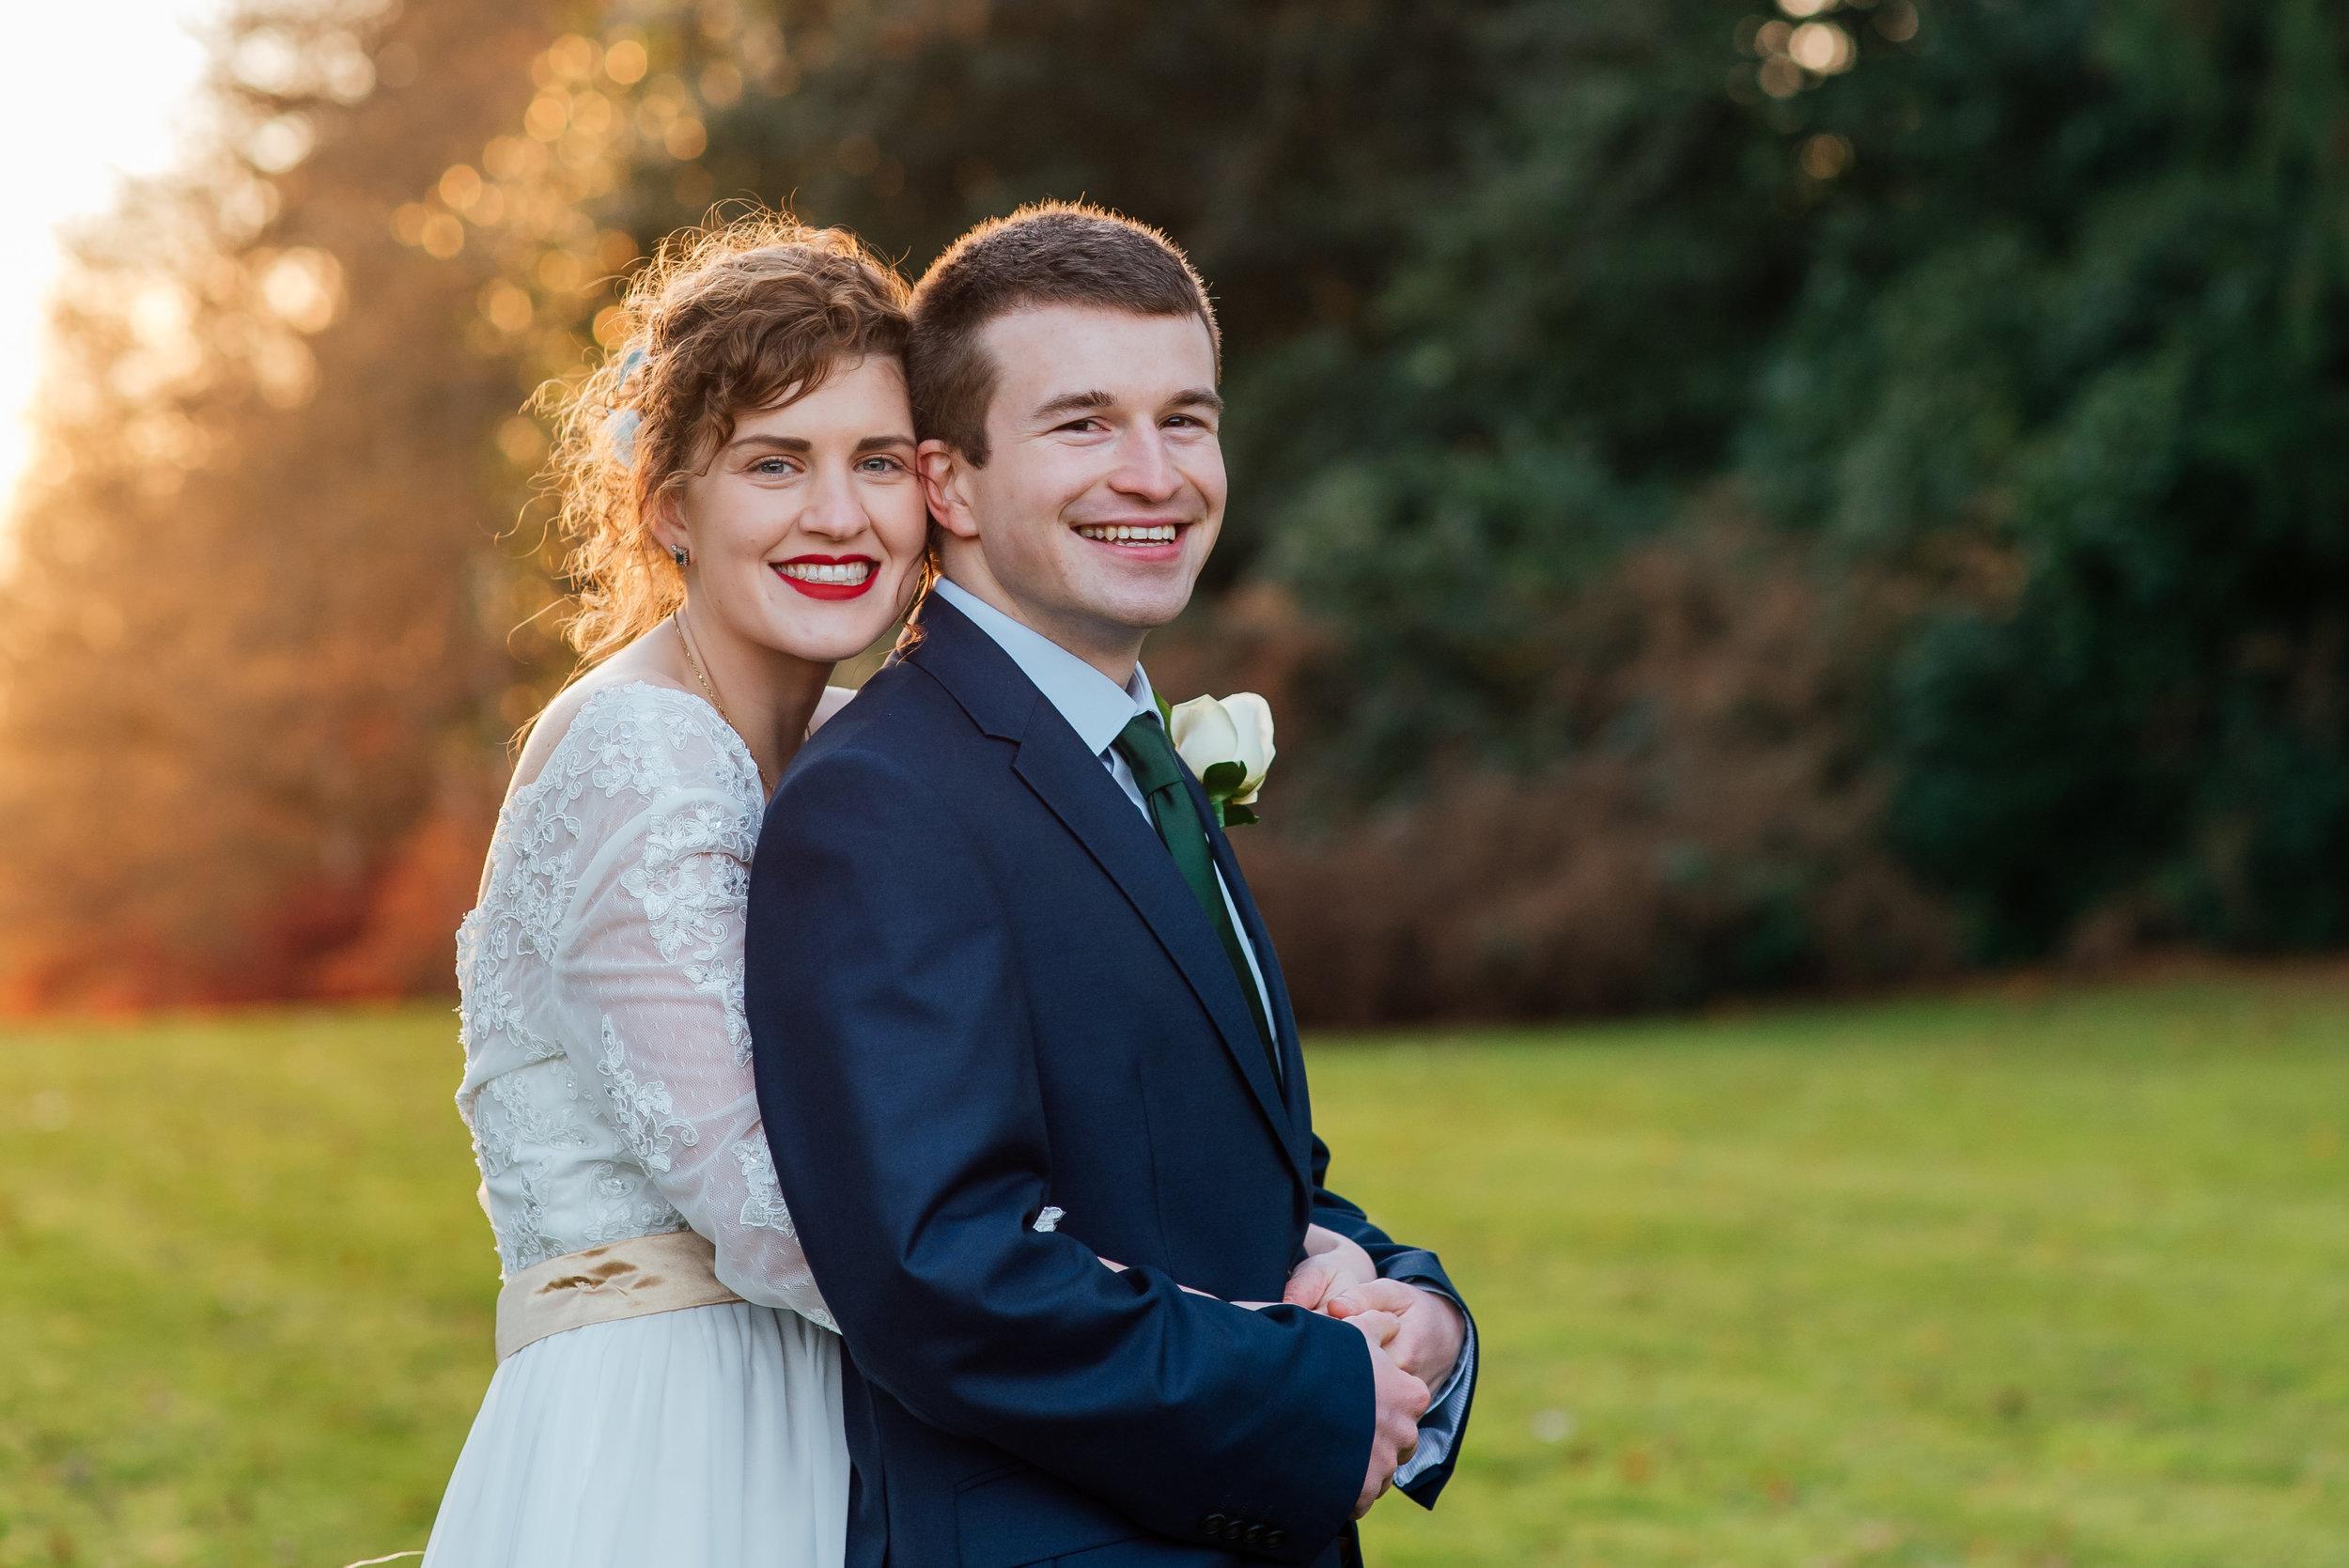 Hampshire-wedding-photographer-hampshire : Amy-James-Photography : Tylney-Hall-Wedding : Tyleny-Hall-Wedding-Photographer : Hampshire-wedding-venue : Fleet-wedding-photographer-farnborough-540.jpg